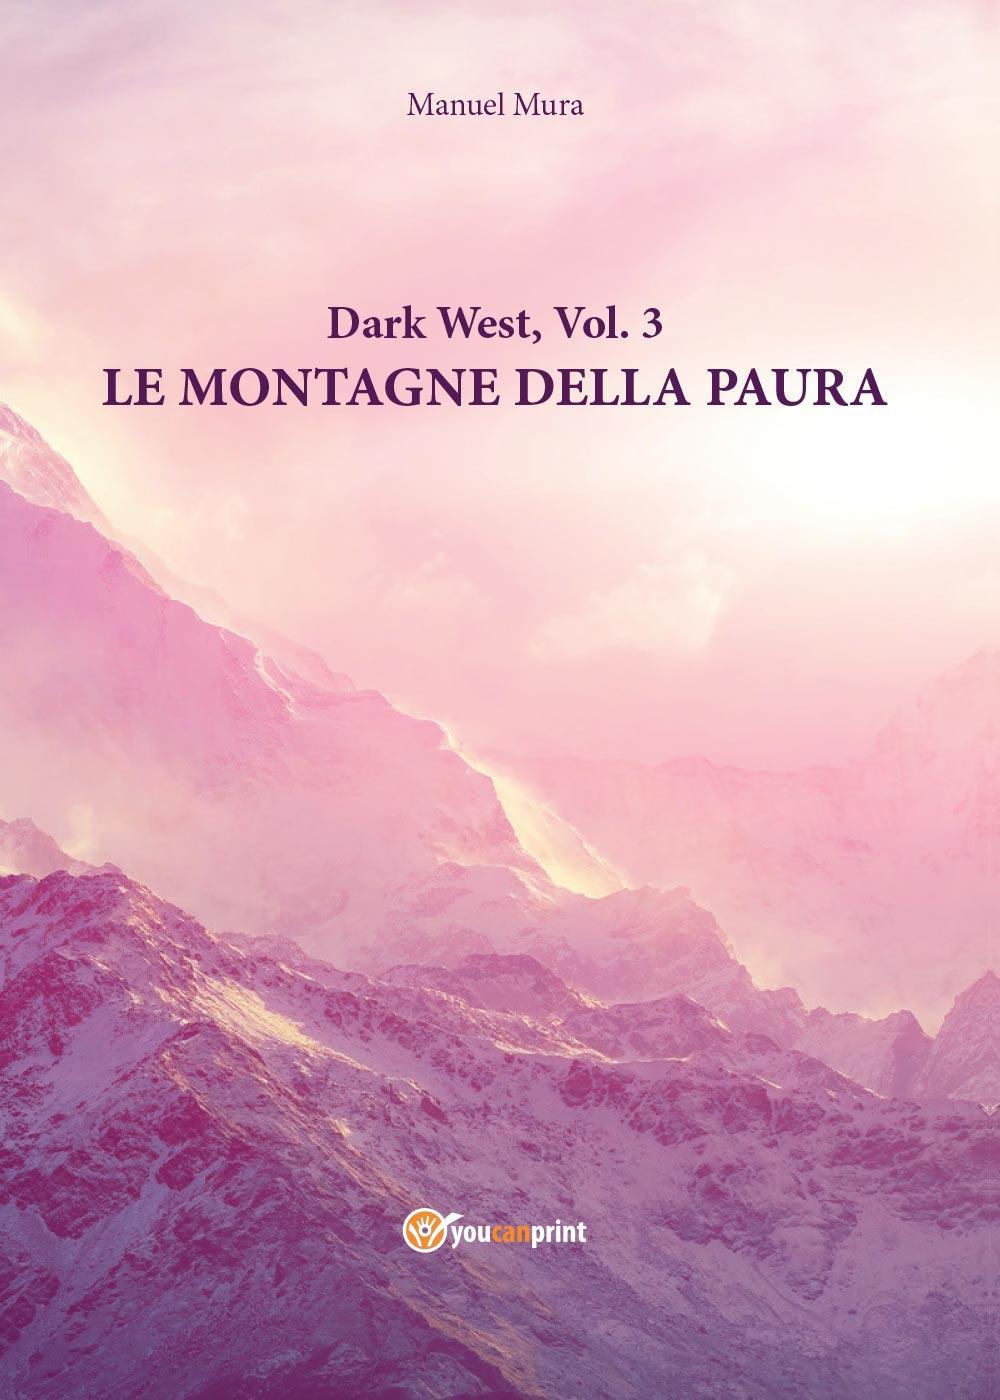 Dark West vol.3 - Le montagne della paura